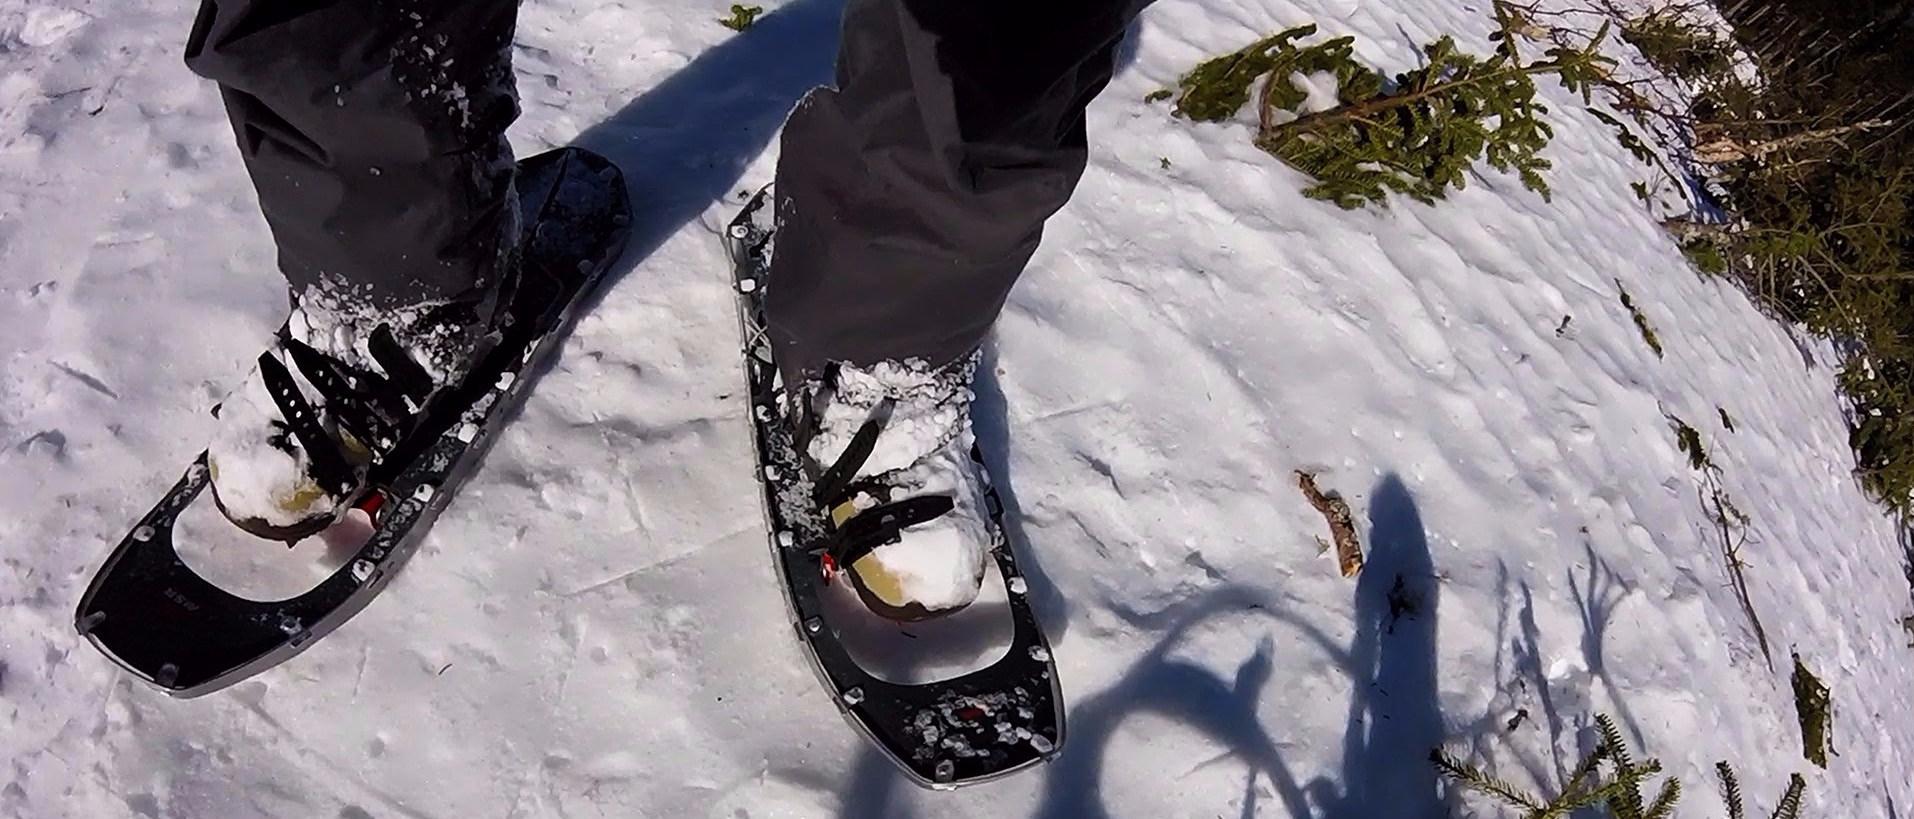 msr-lightning-ascent-snowshoes_snowboard-boot-e1490670607932.jpg